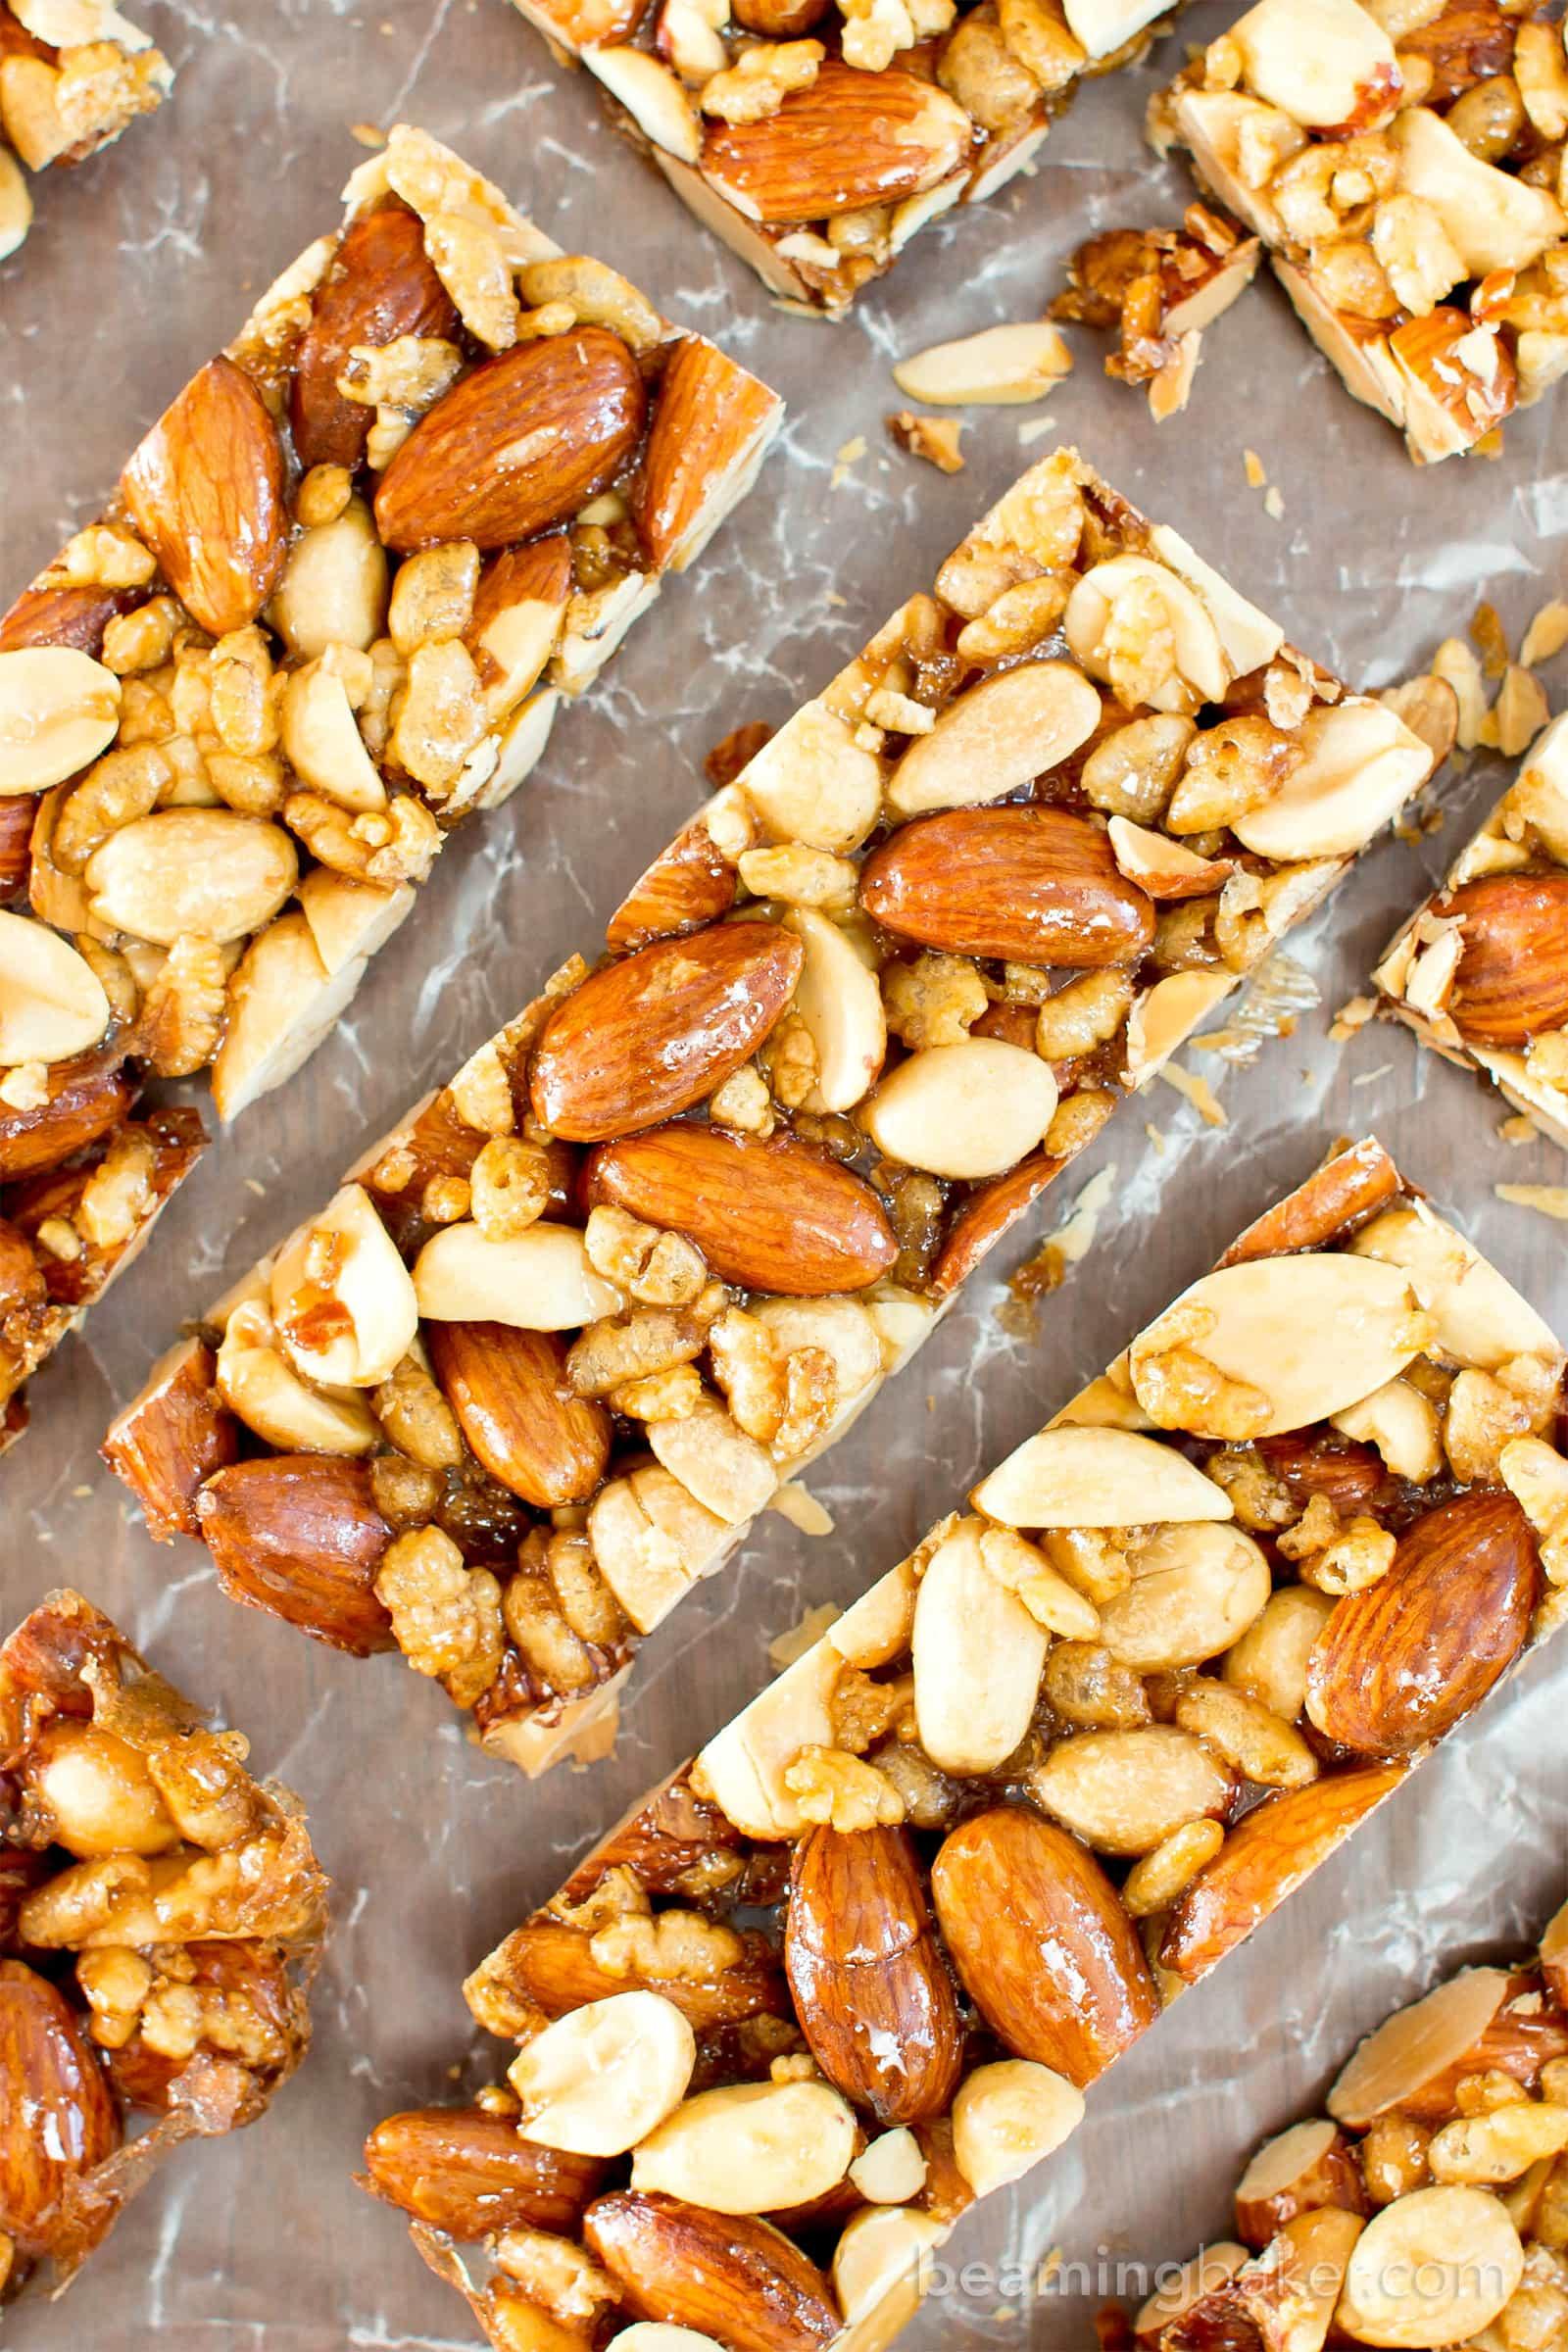 Healthy Vegan Snack Recipes  15 Easy Healthy Gluten Free Vegan Snack Recipes Beaming